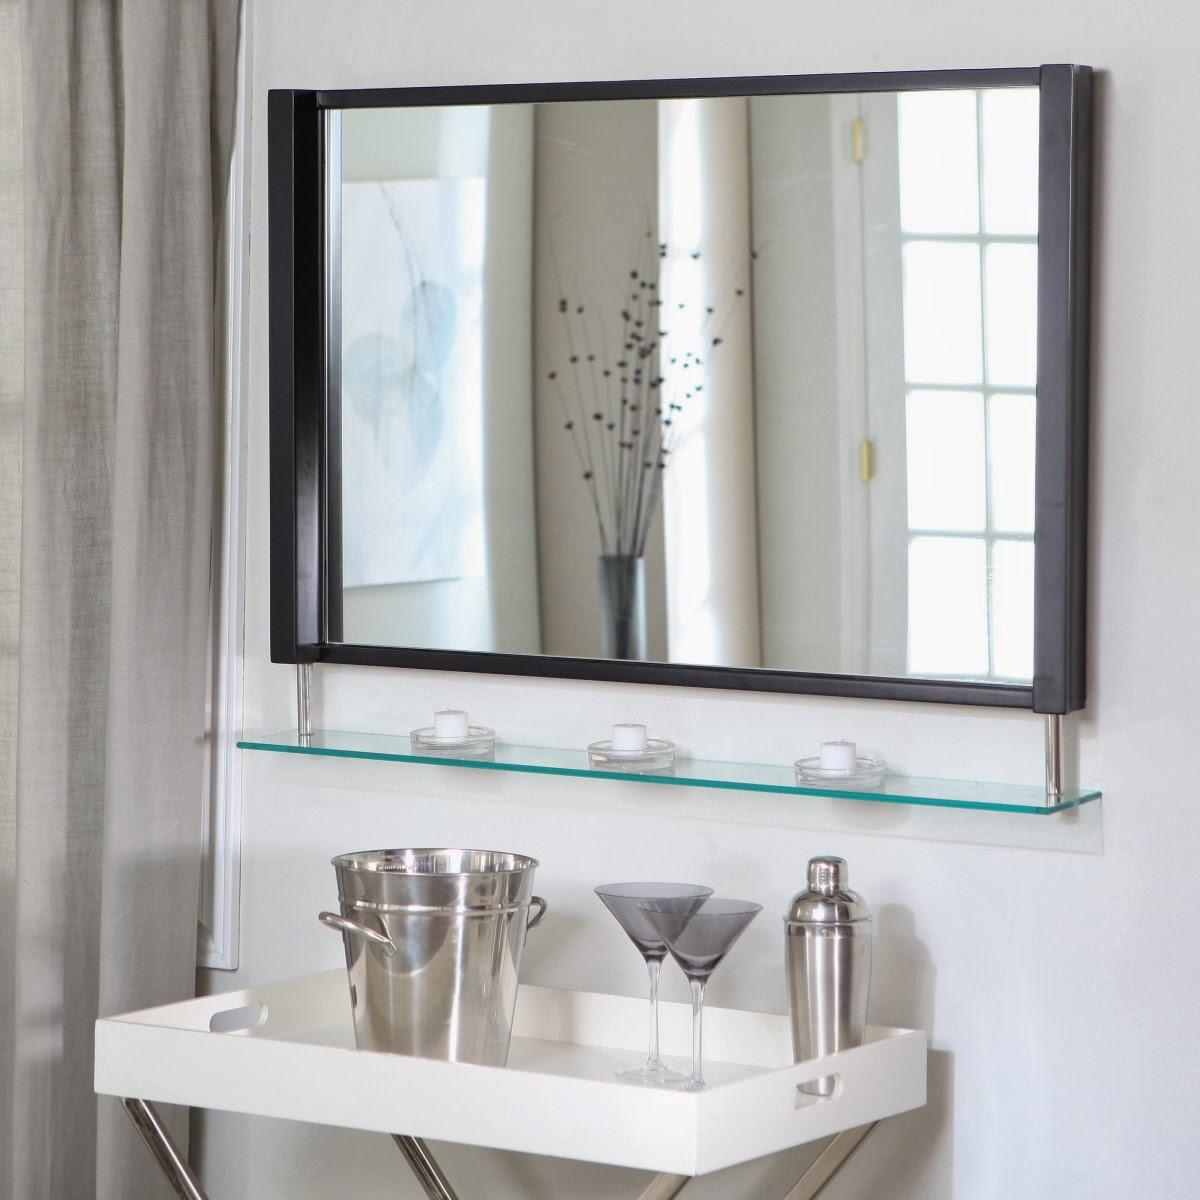 bathroom wall mirrors bedroom and bathroom ideas. Black Bedroom Furniture Sets. Home Design Ideas